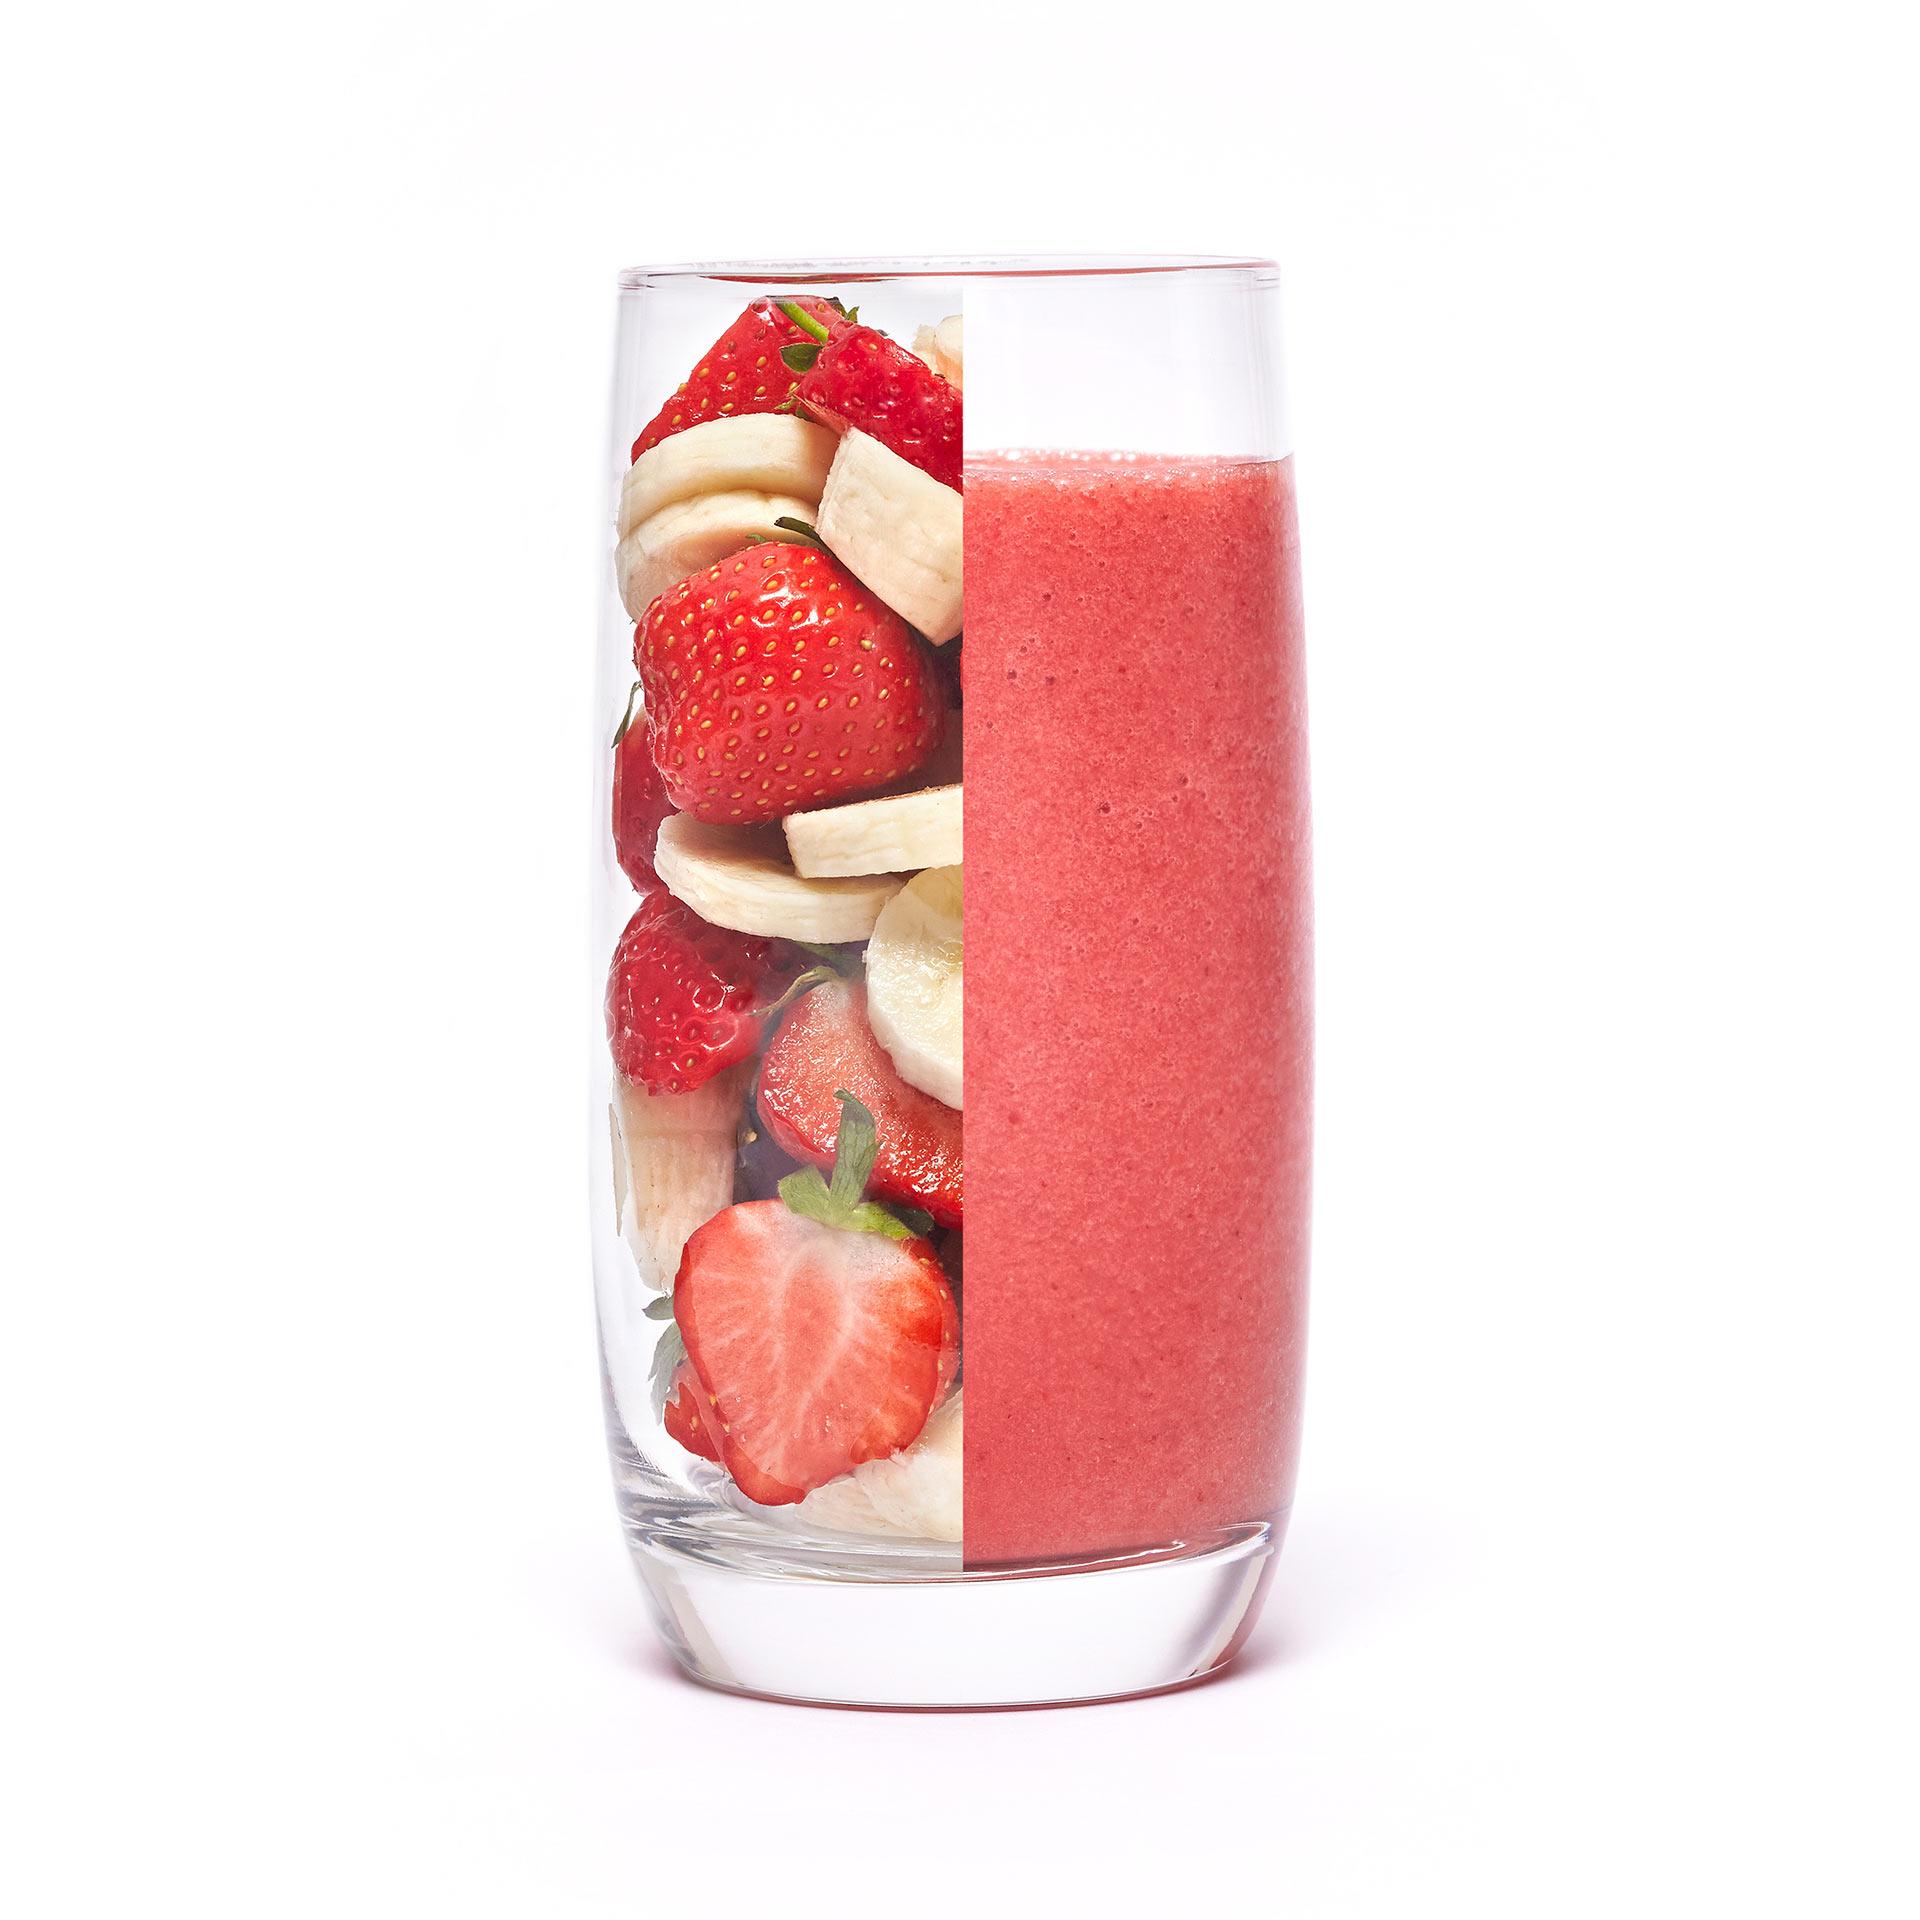 Strawberry-Banana-half&half.jpg